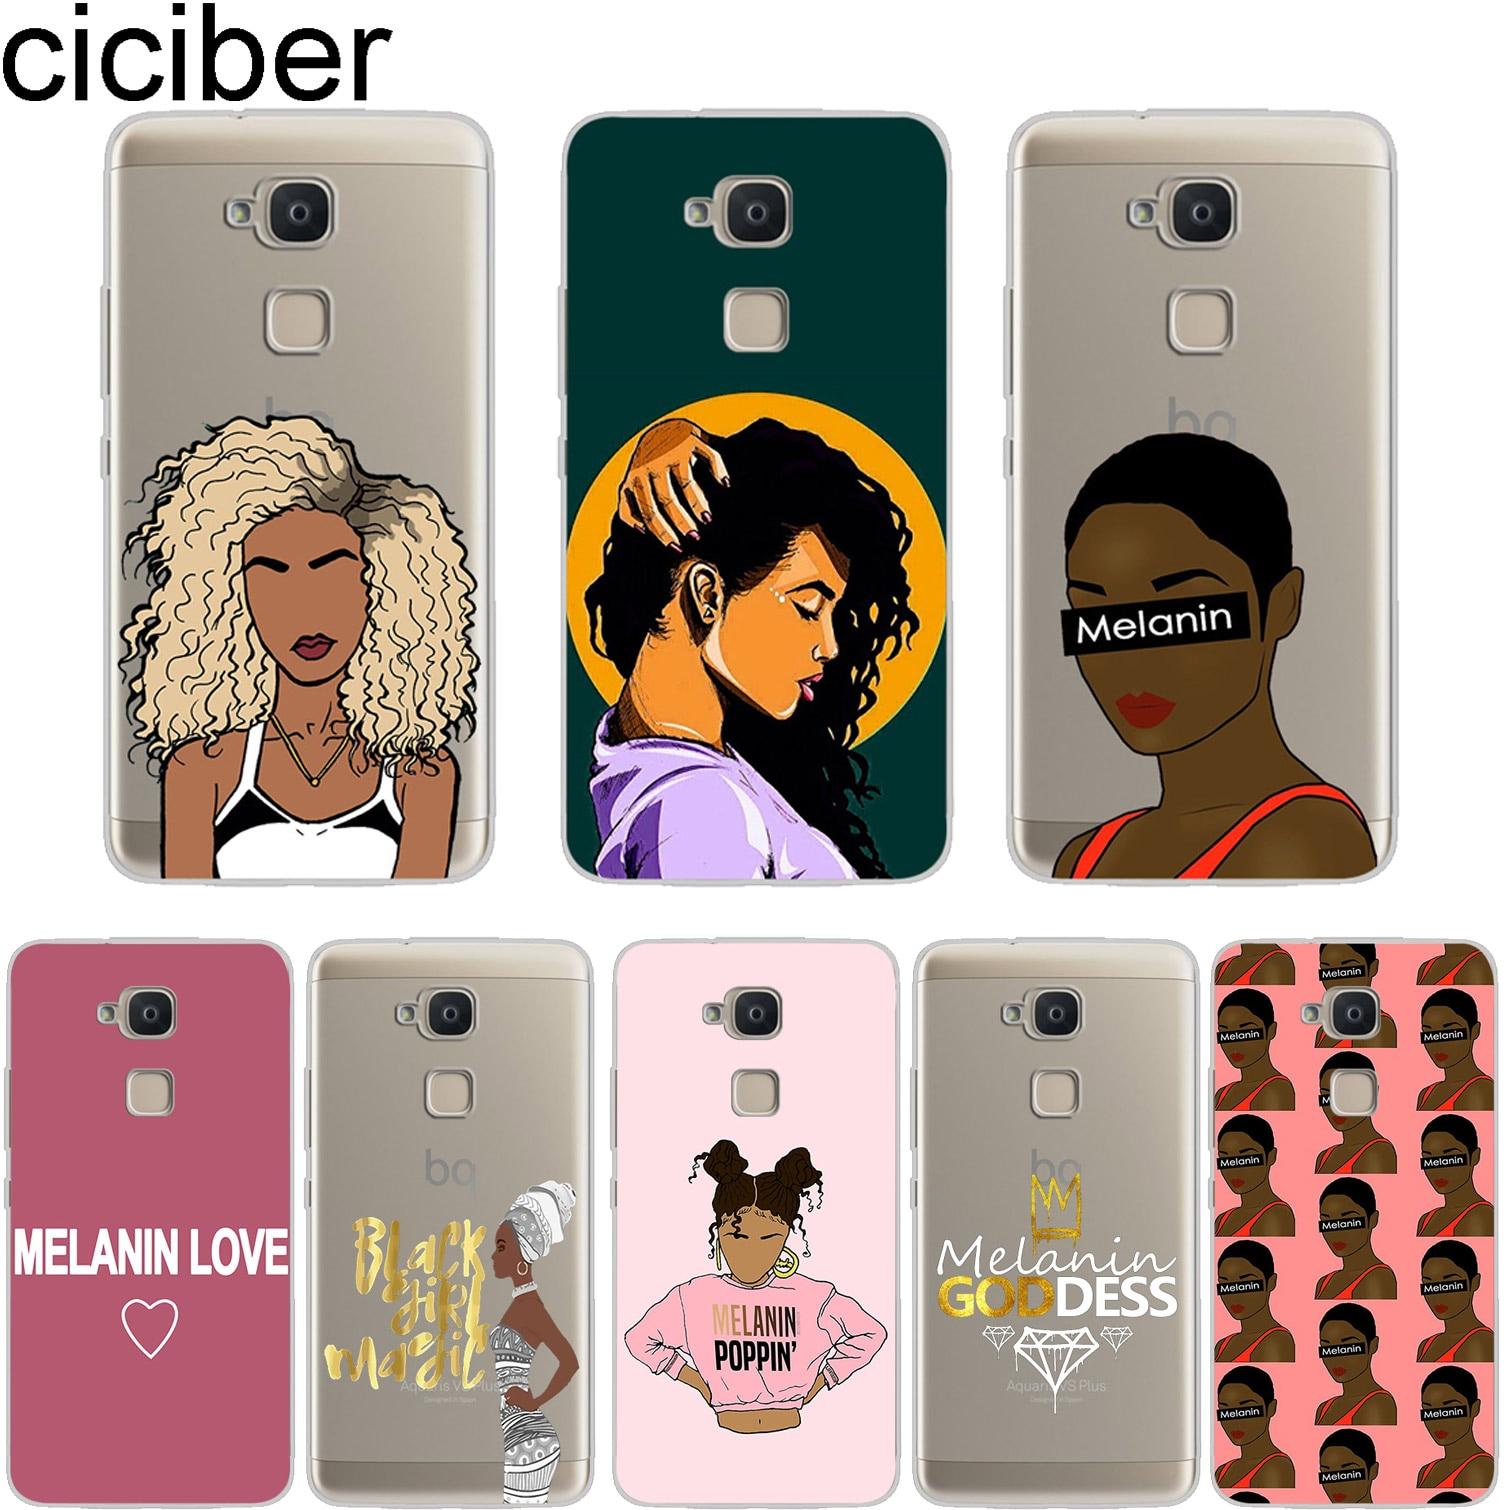 Fitted Cases Efficient Ciciber Phone Case For Bq Aquaris X2 X Pro V Vs U U2 Lite Plus Cover For Aquaris E5s 4.5 M5 M5.5 M4.5 X5 Soft Tpu Melanin Poppin Cellphones & Telecommunications